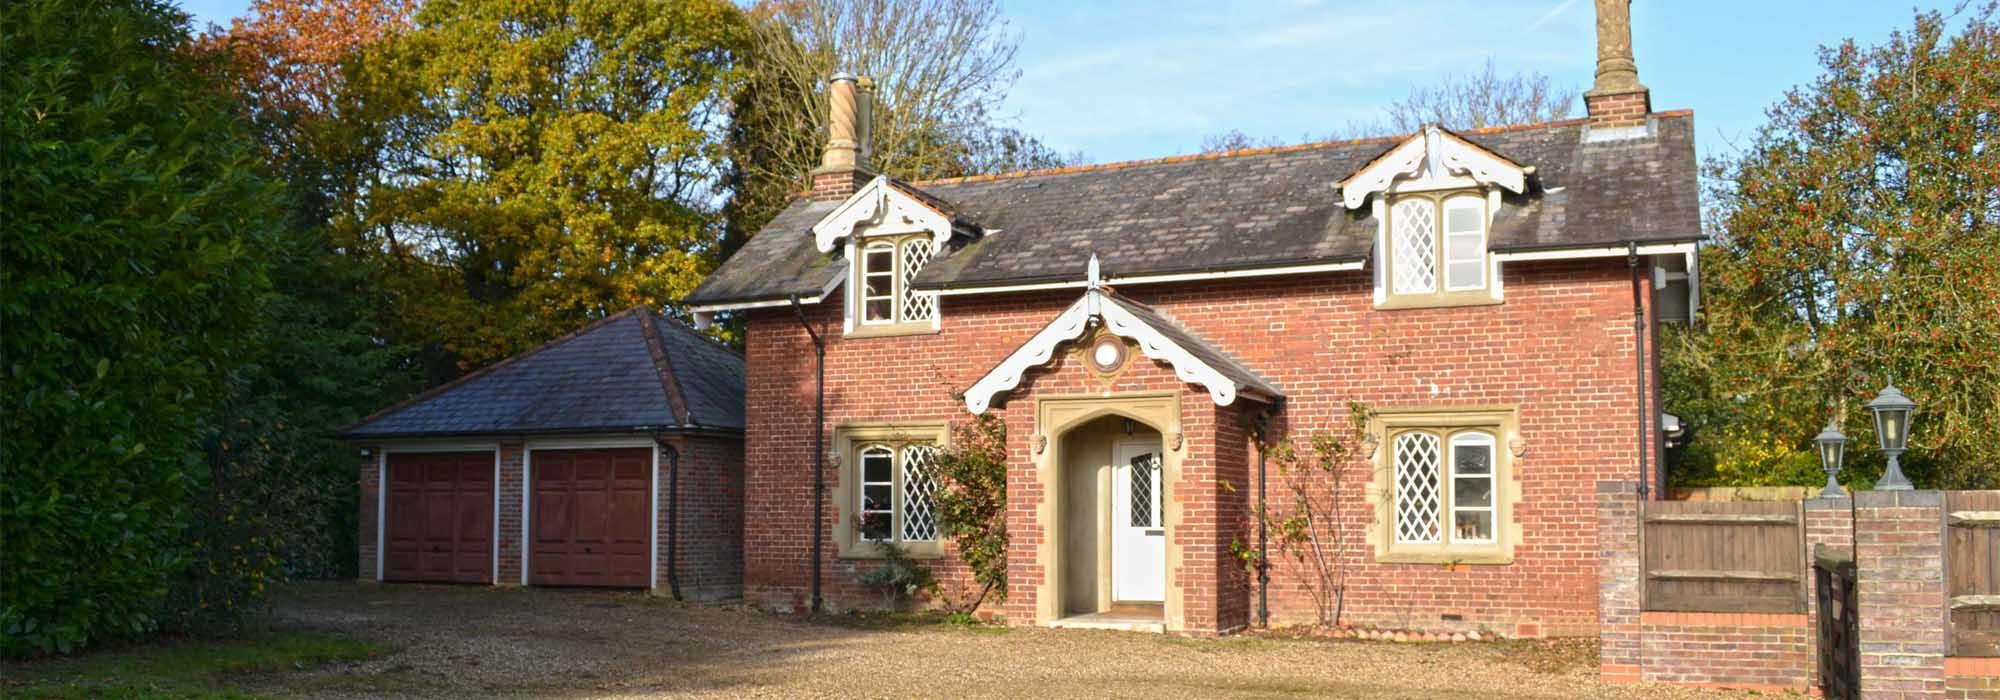 Gardner Cottage, Broxbournebury Mews, Broxbourne, Hertfordshire, EN10 7JA